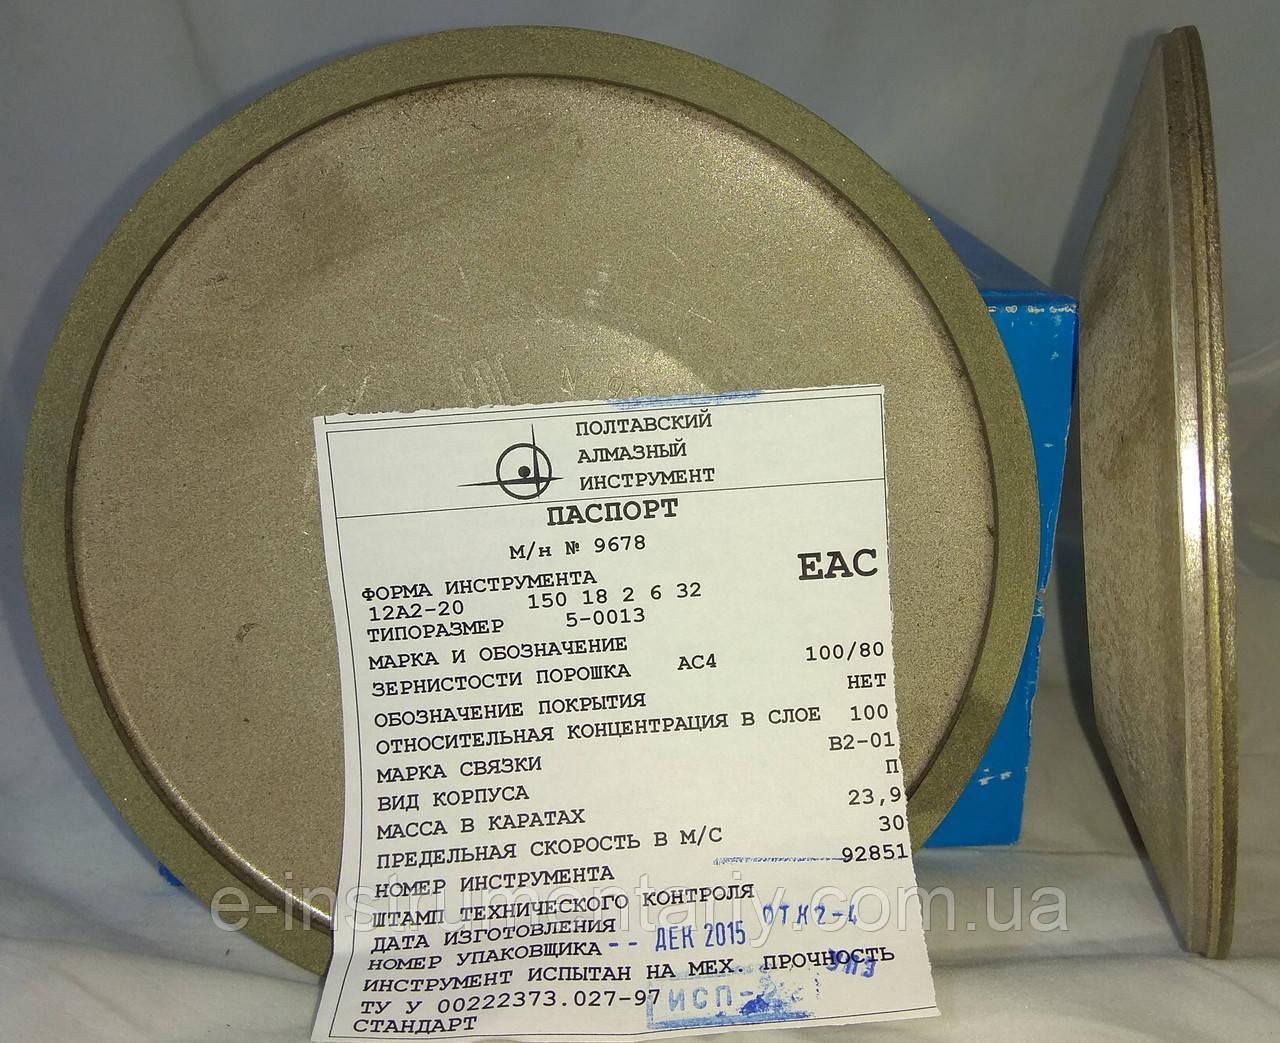 Алмазный круг Тарелка(12А2-20) 150х6х2х18х32 100% АС4 Связка В2-01